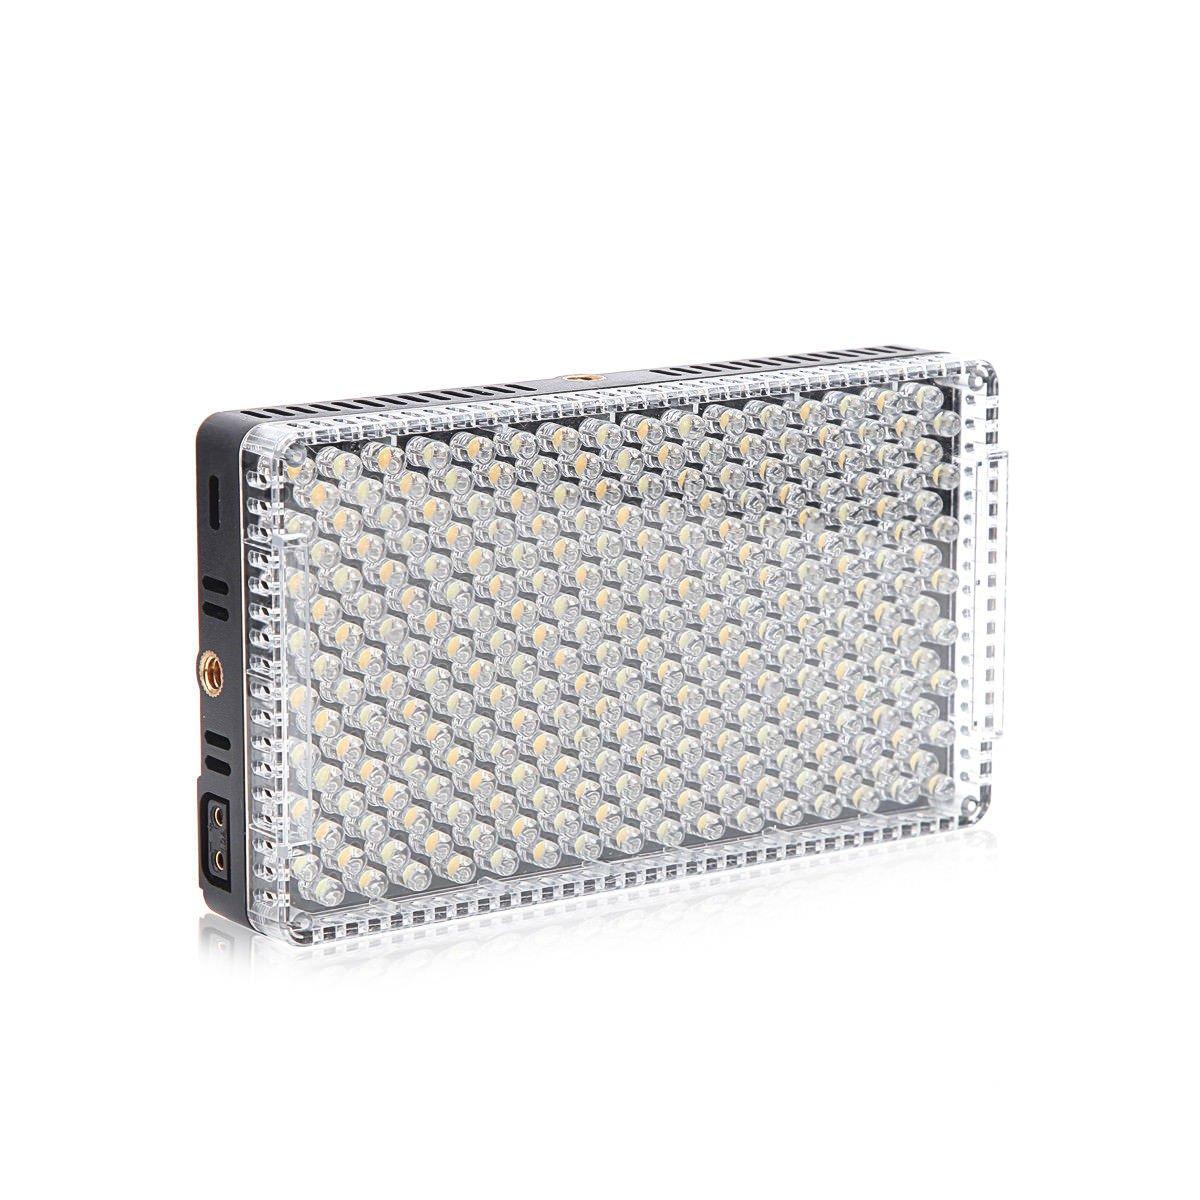 Aputure Amaran AL-F7 3200-9500K CRI/TLCI 95 LED panel LED video camera light (Aputure H198 Upgrade Version) with DigiKit cleaning cloth by Aputure (Image #5)